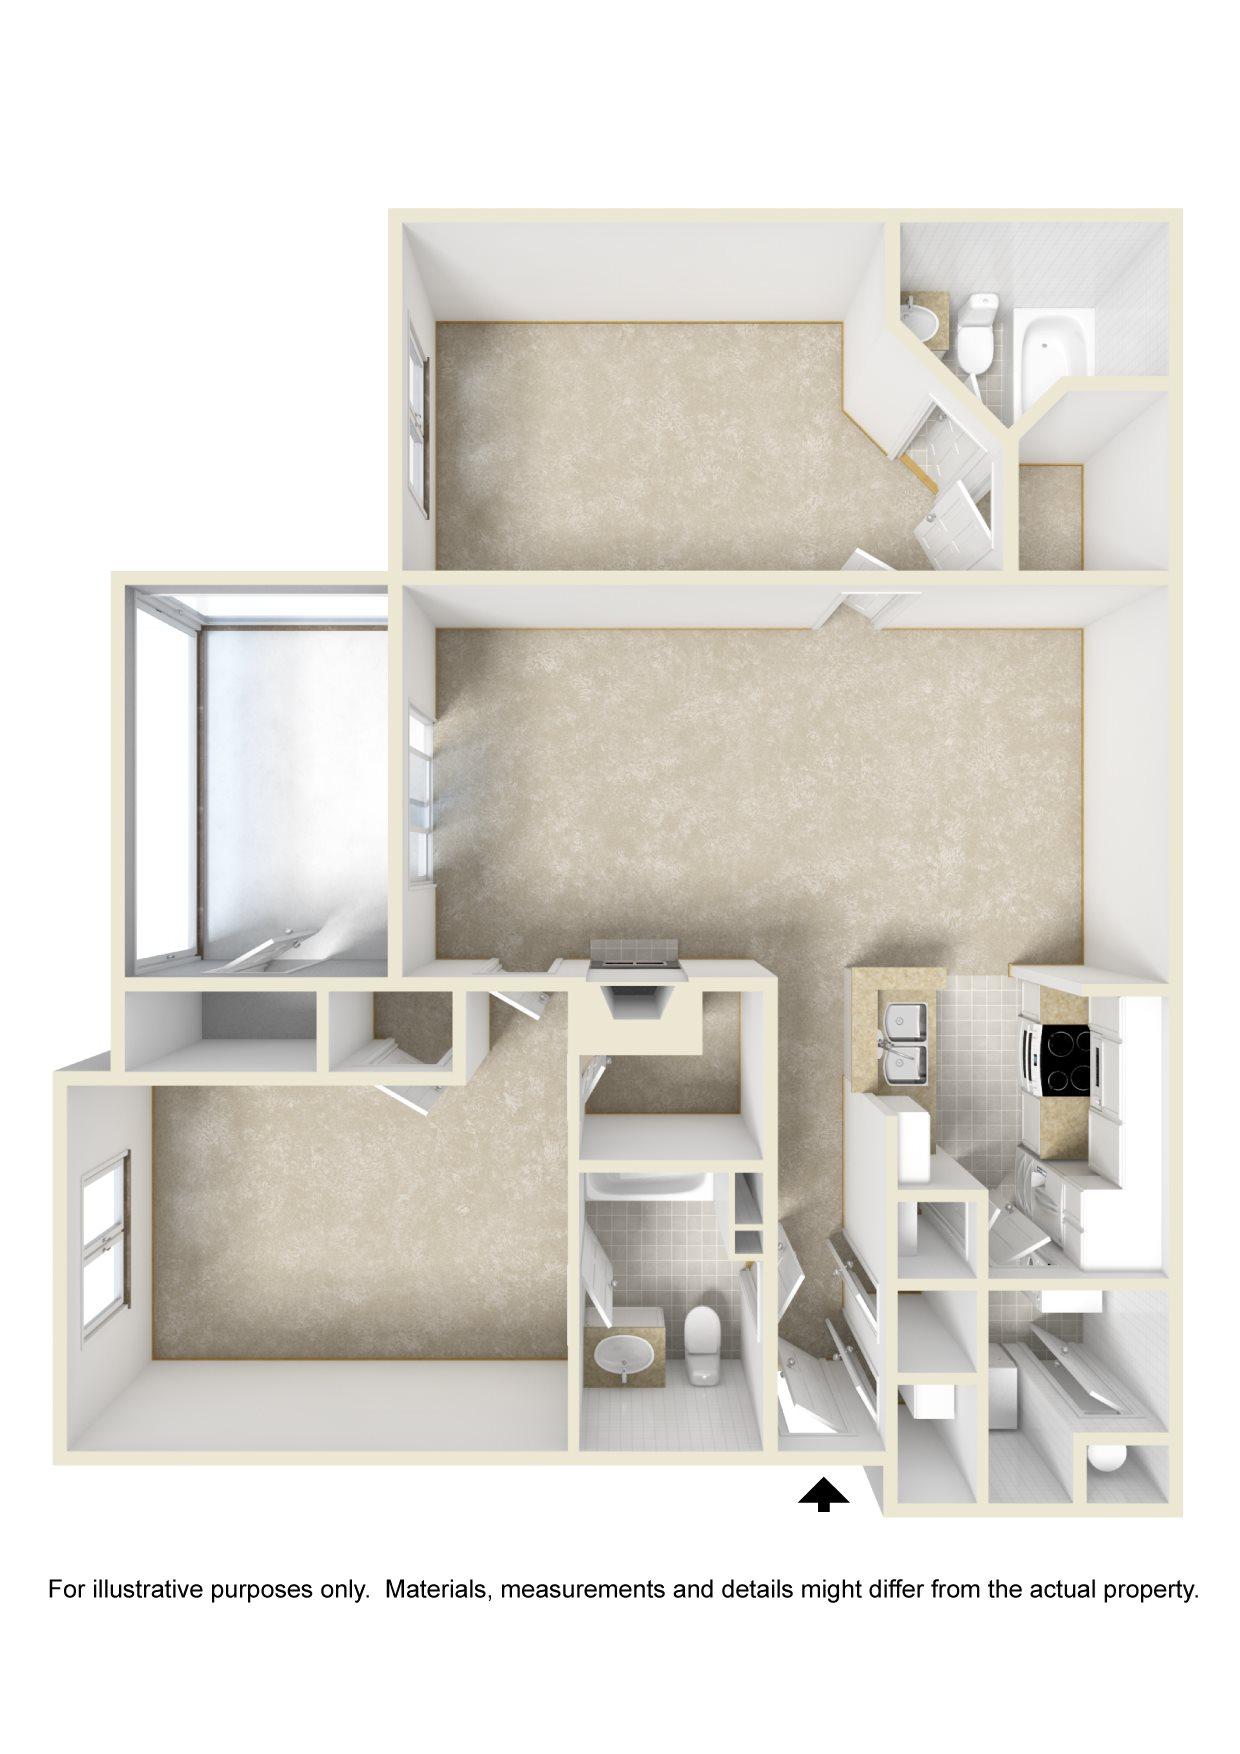 The Royale Floor Plan 2